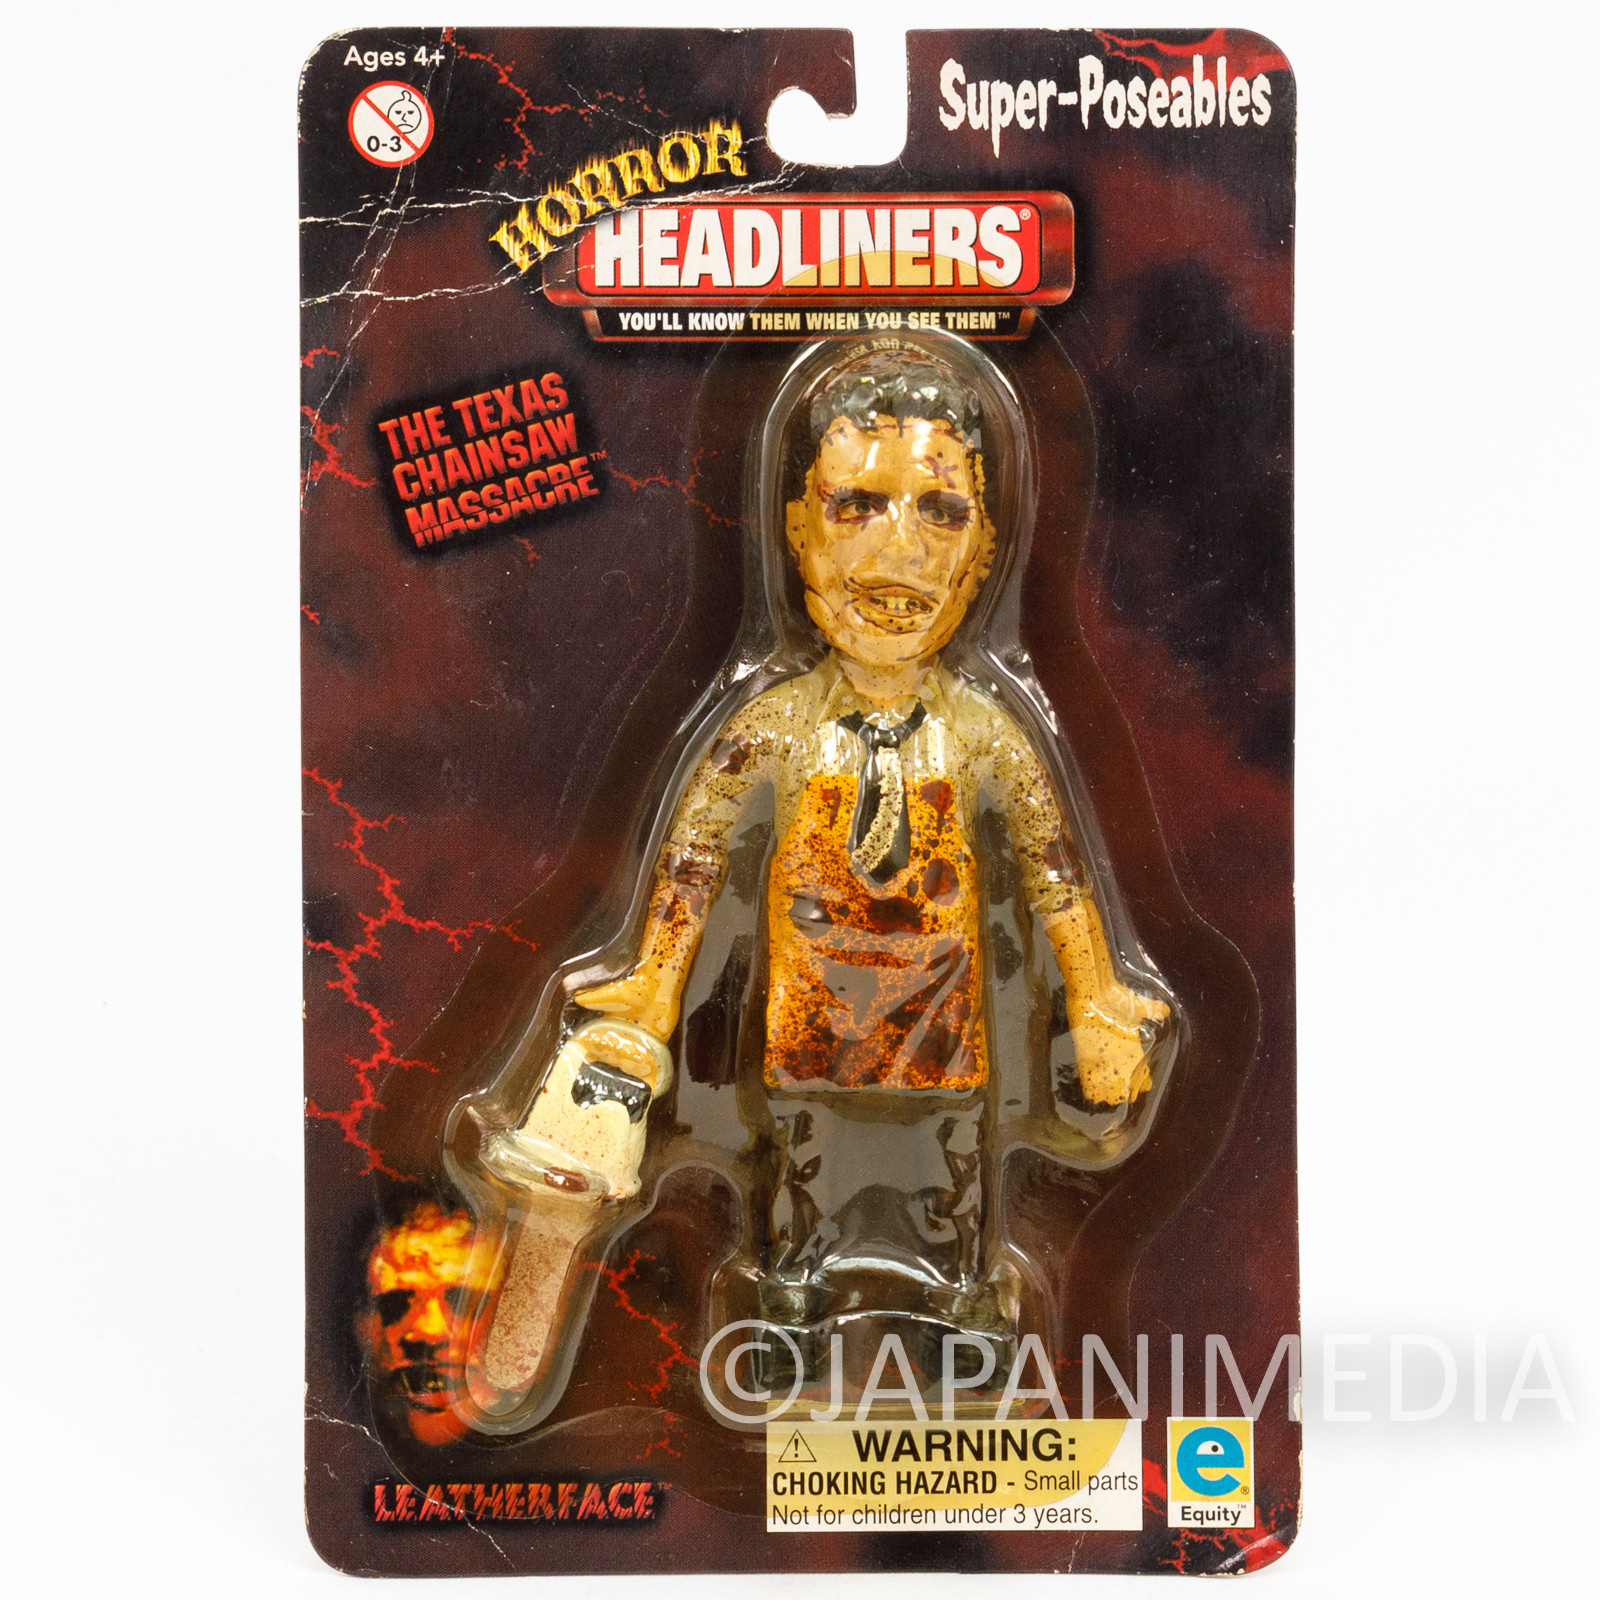 Texas Chainsaw Massacre Leatherface Super Poseable Figure Horror Headliners